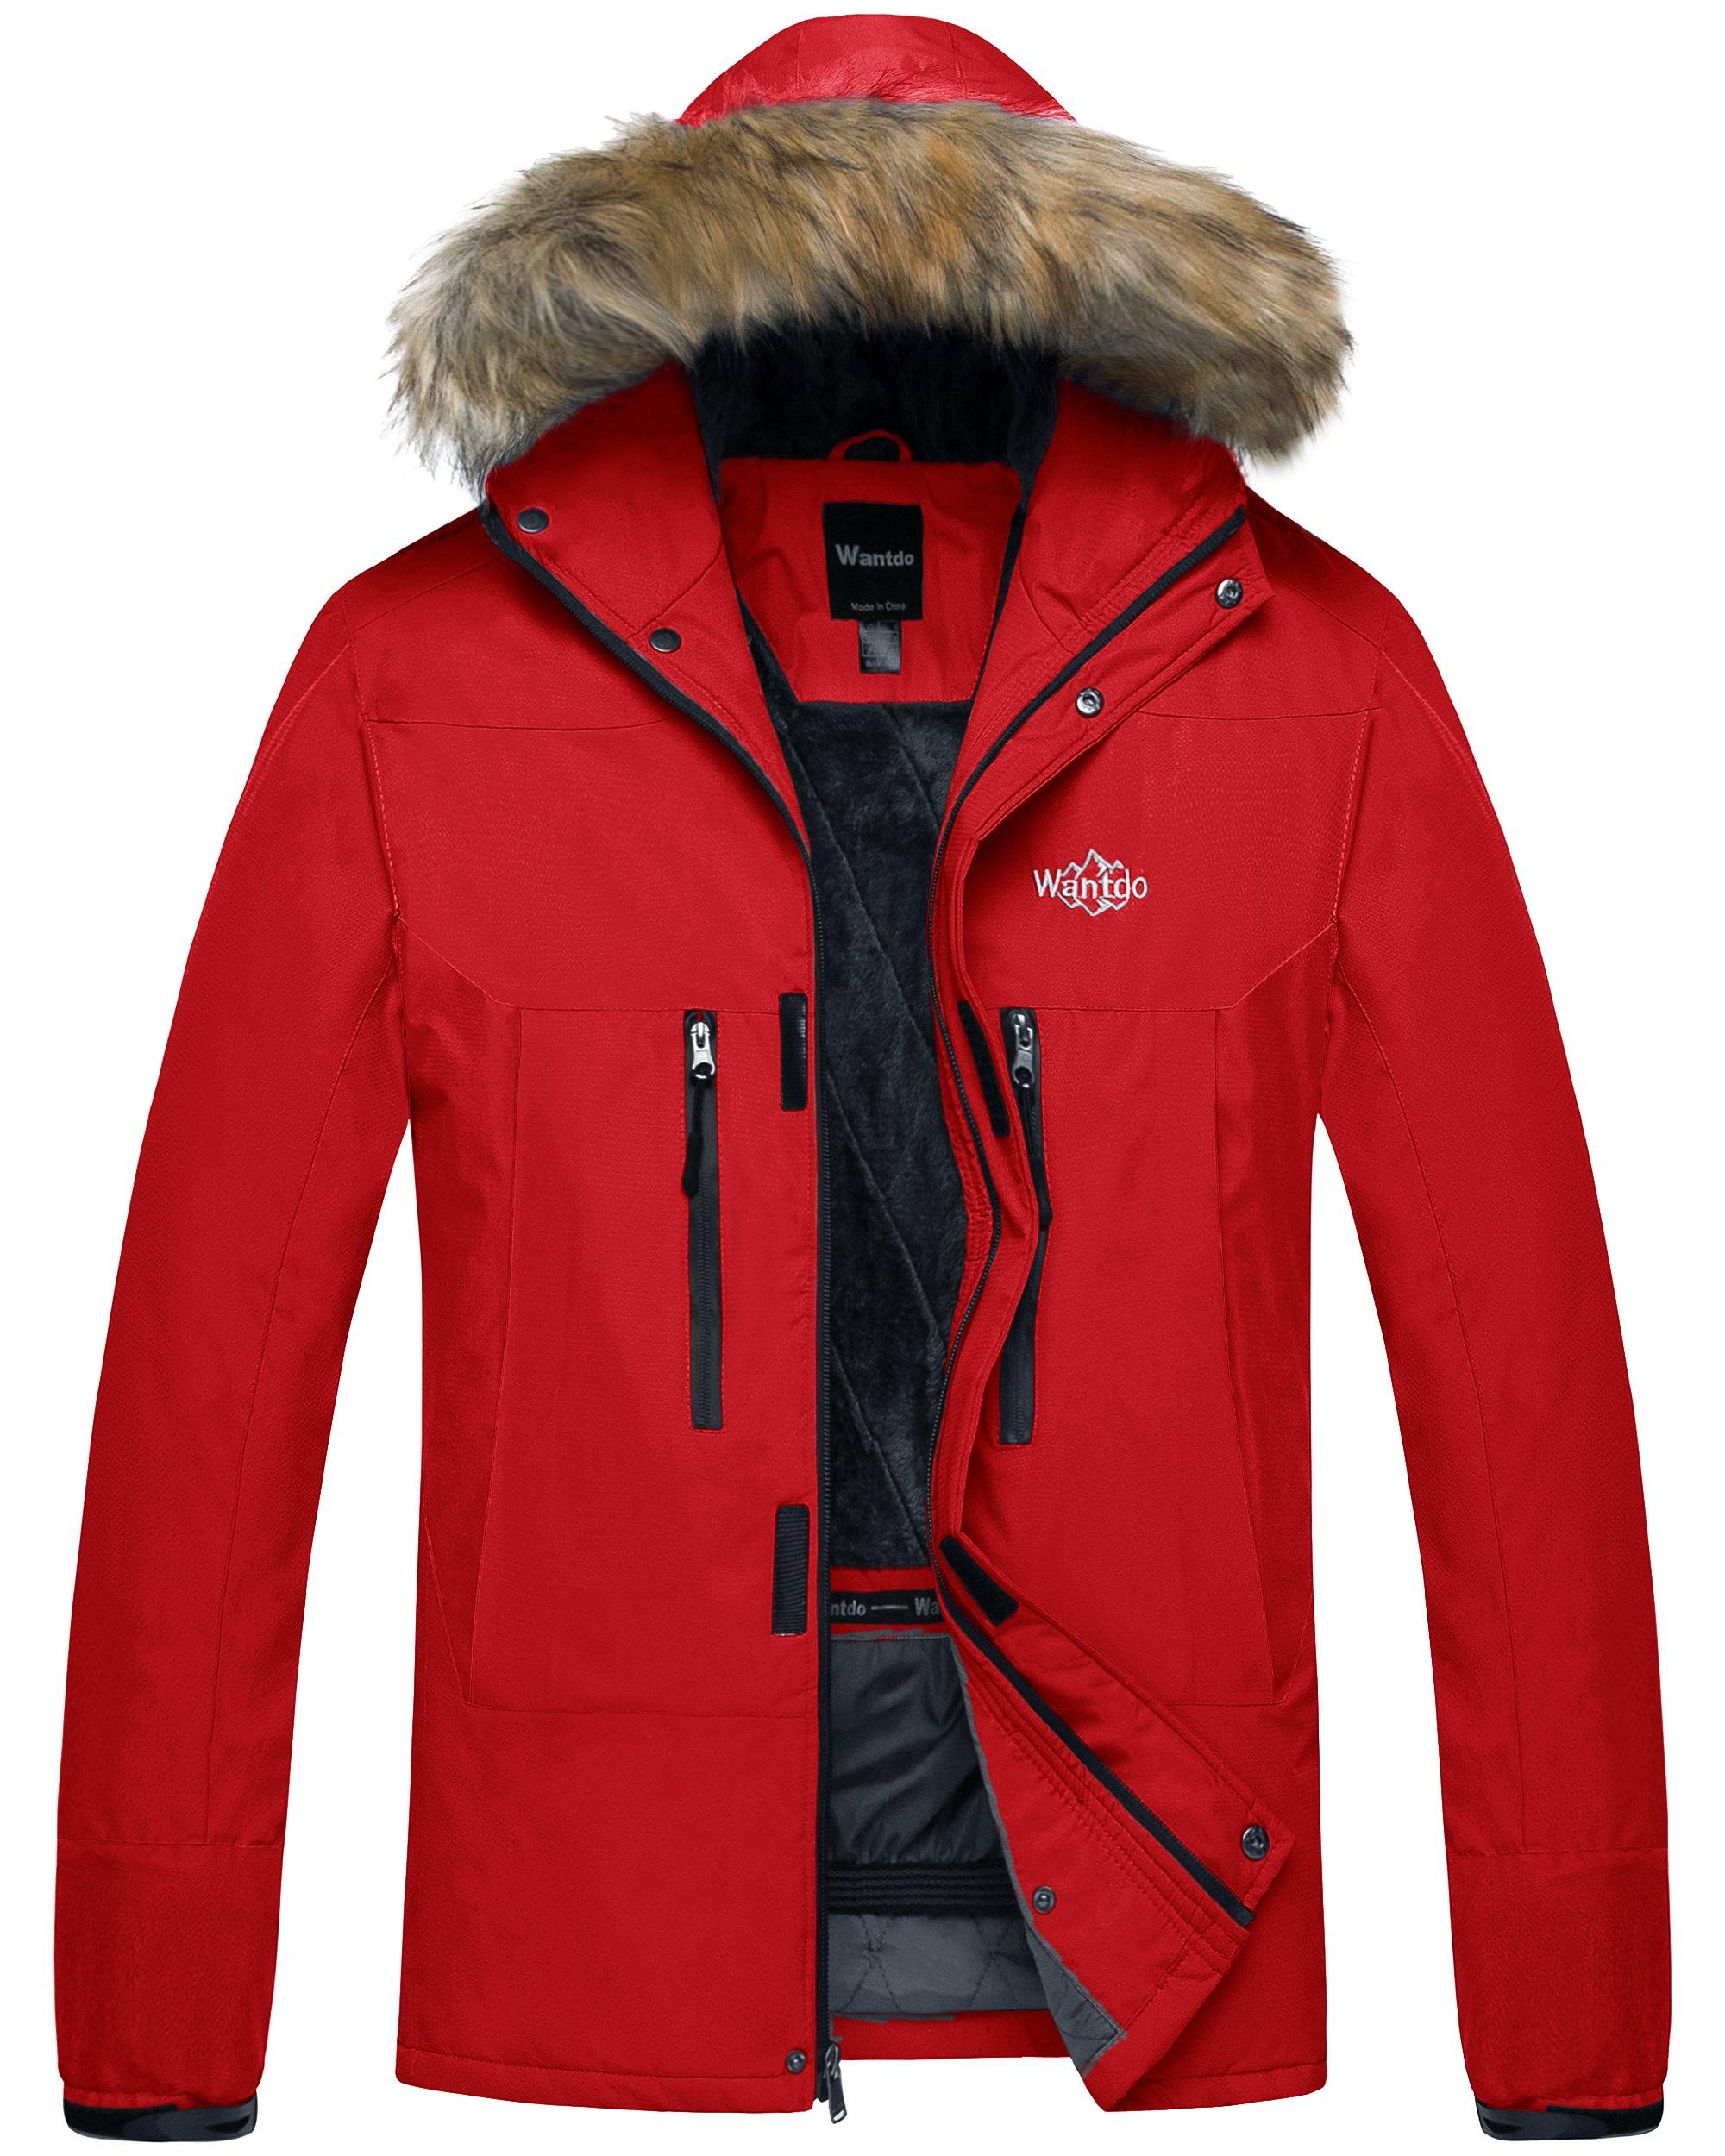 Wantdo Men's Hooded Mountain Rain Jacket Outdoor Fleece Lined Windproof Ski Jacket Red US Large